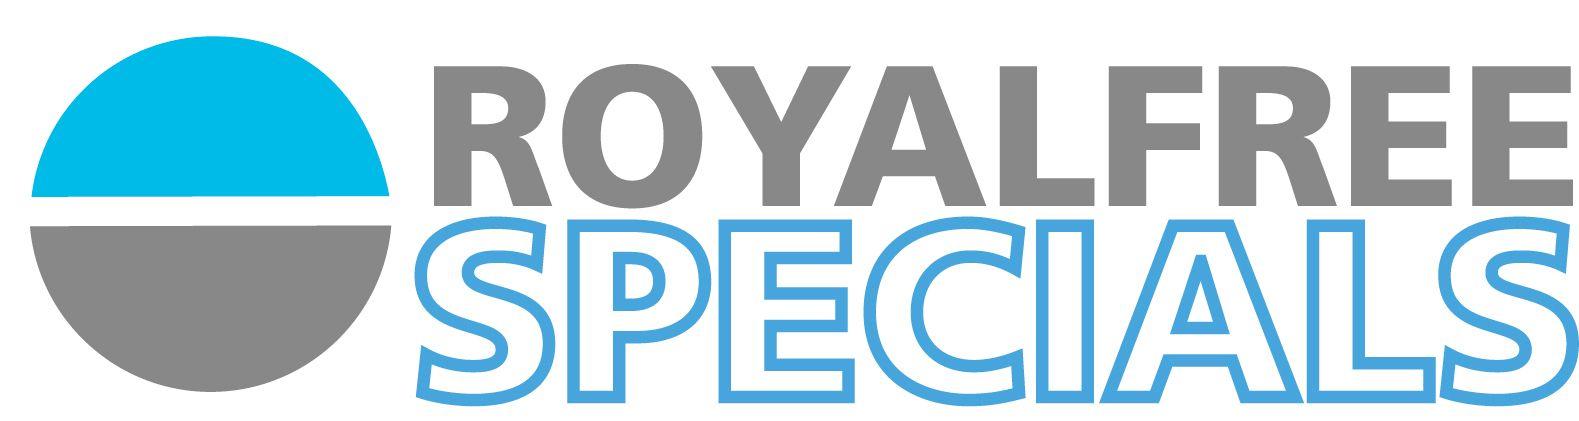 Royal Free Specials